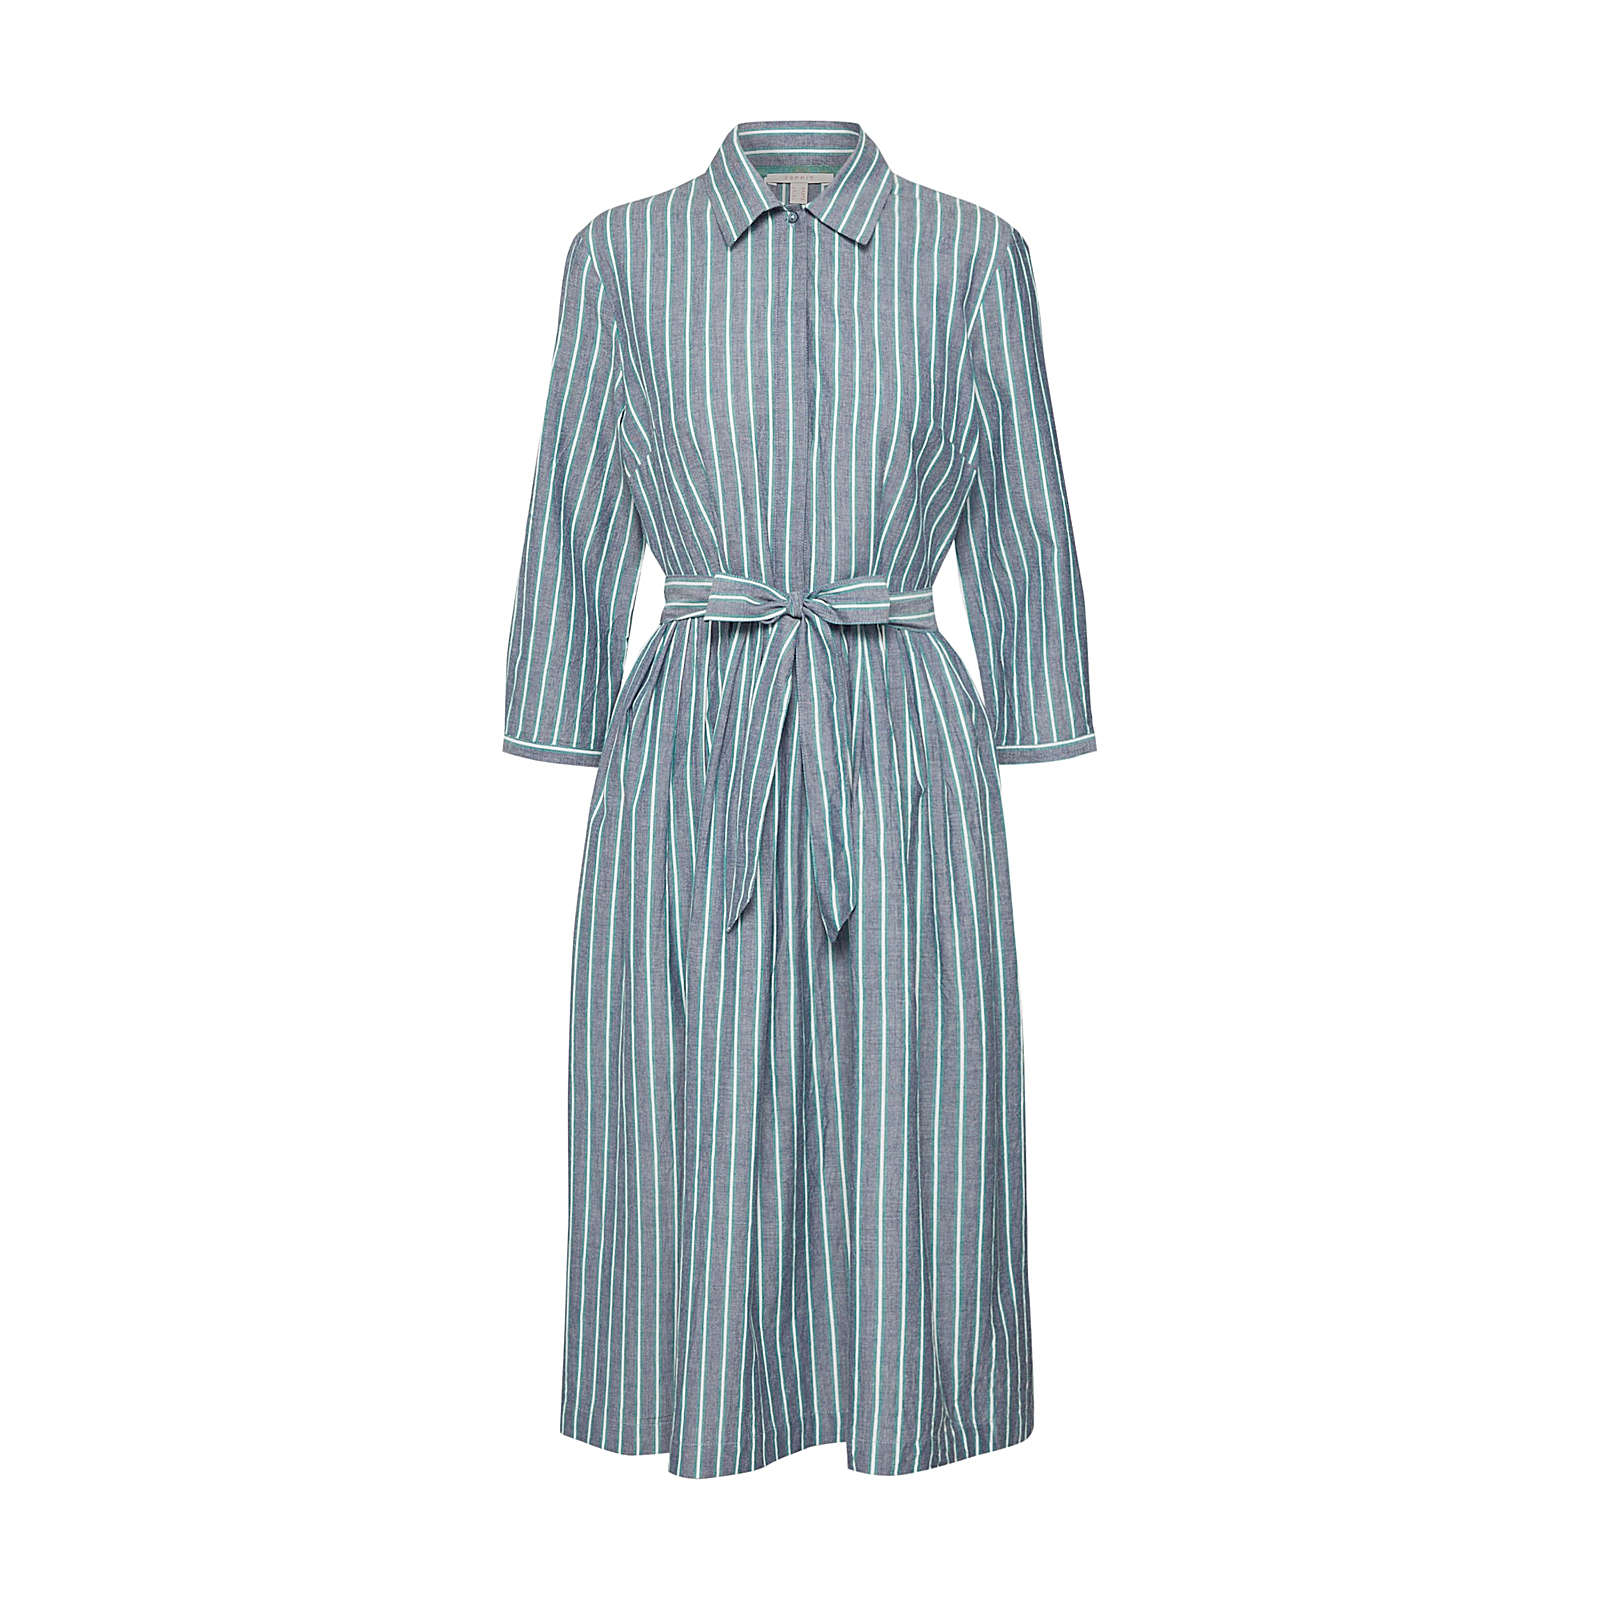 ESPRIT Blusenkleid Blusenkleider grau Damen Gr. 38